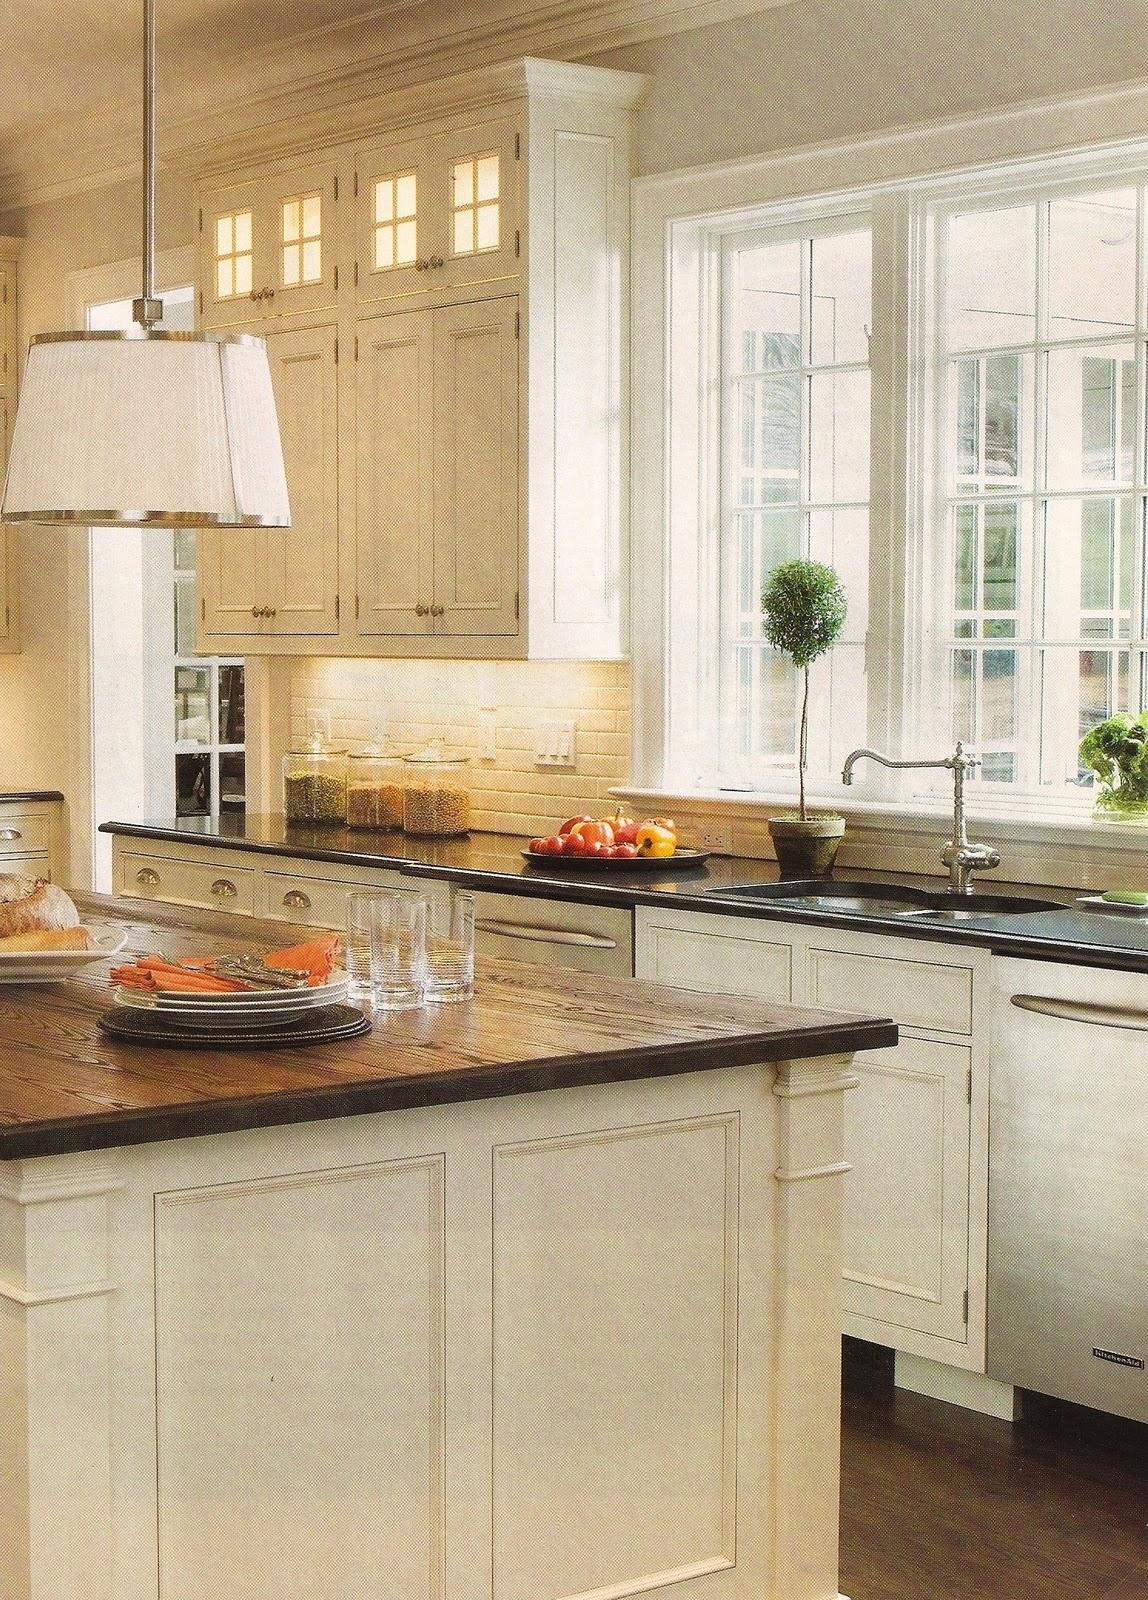 white kitchen countertops rubber mats design dump 43 wood